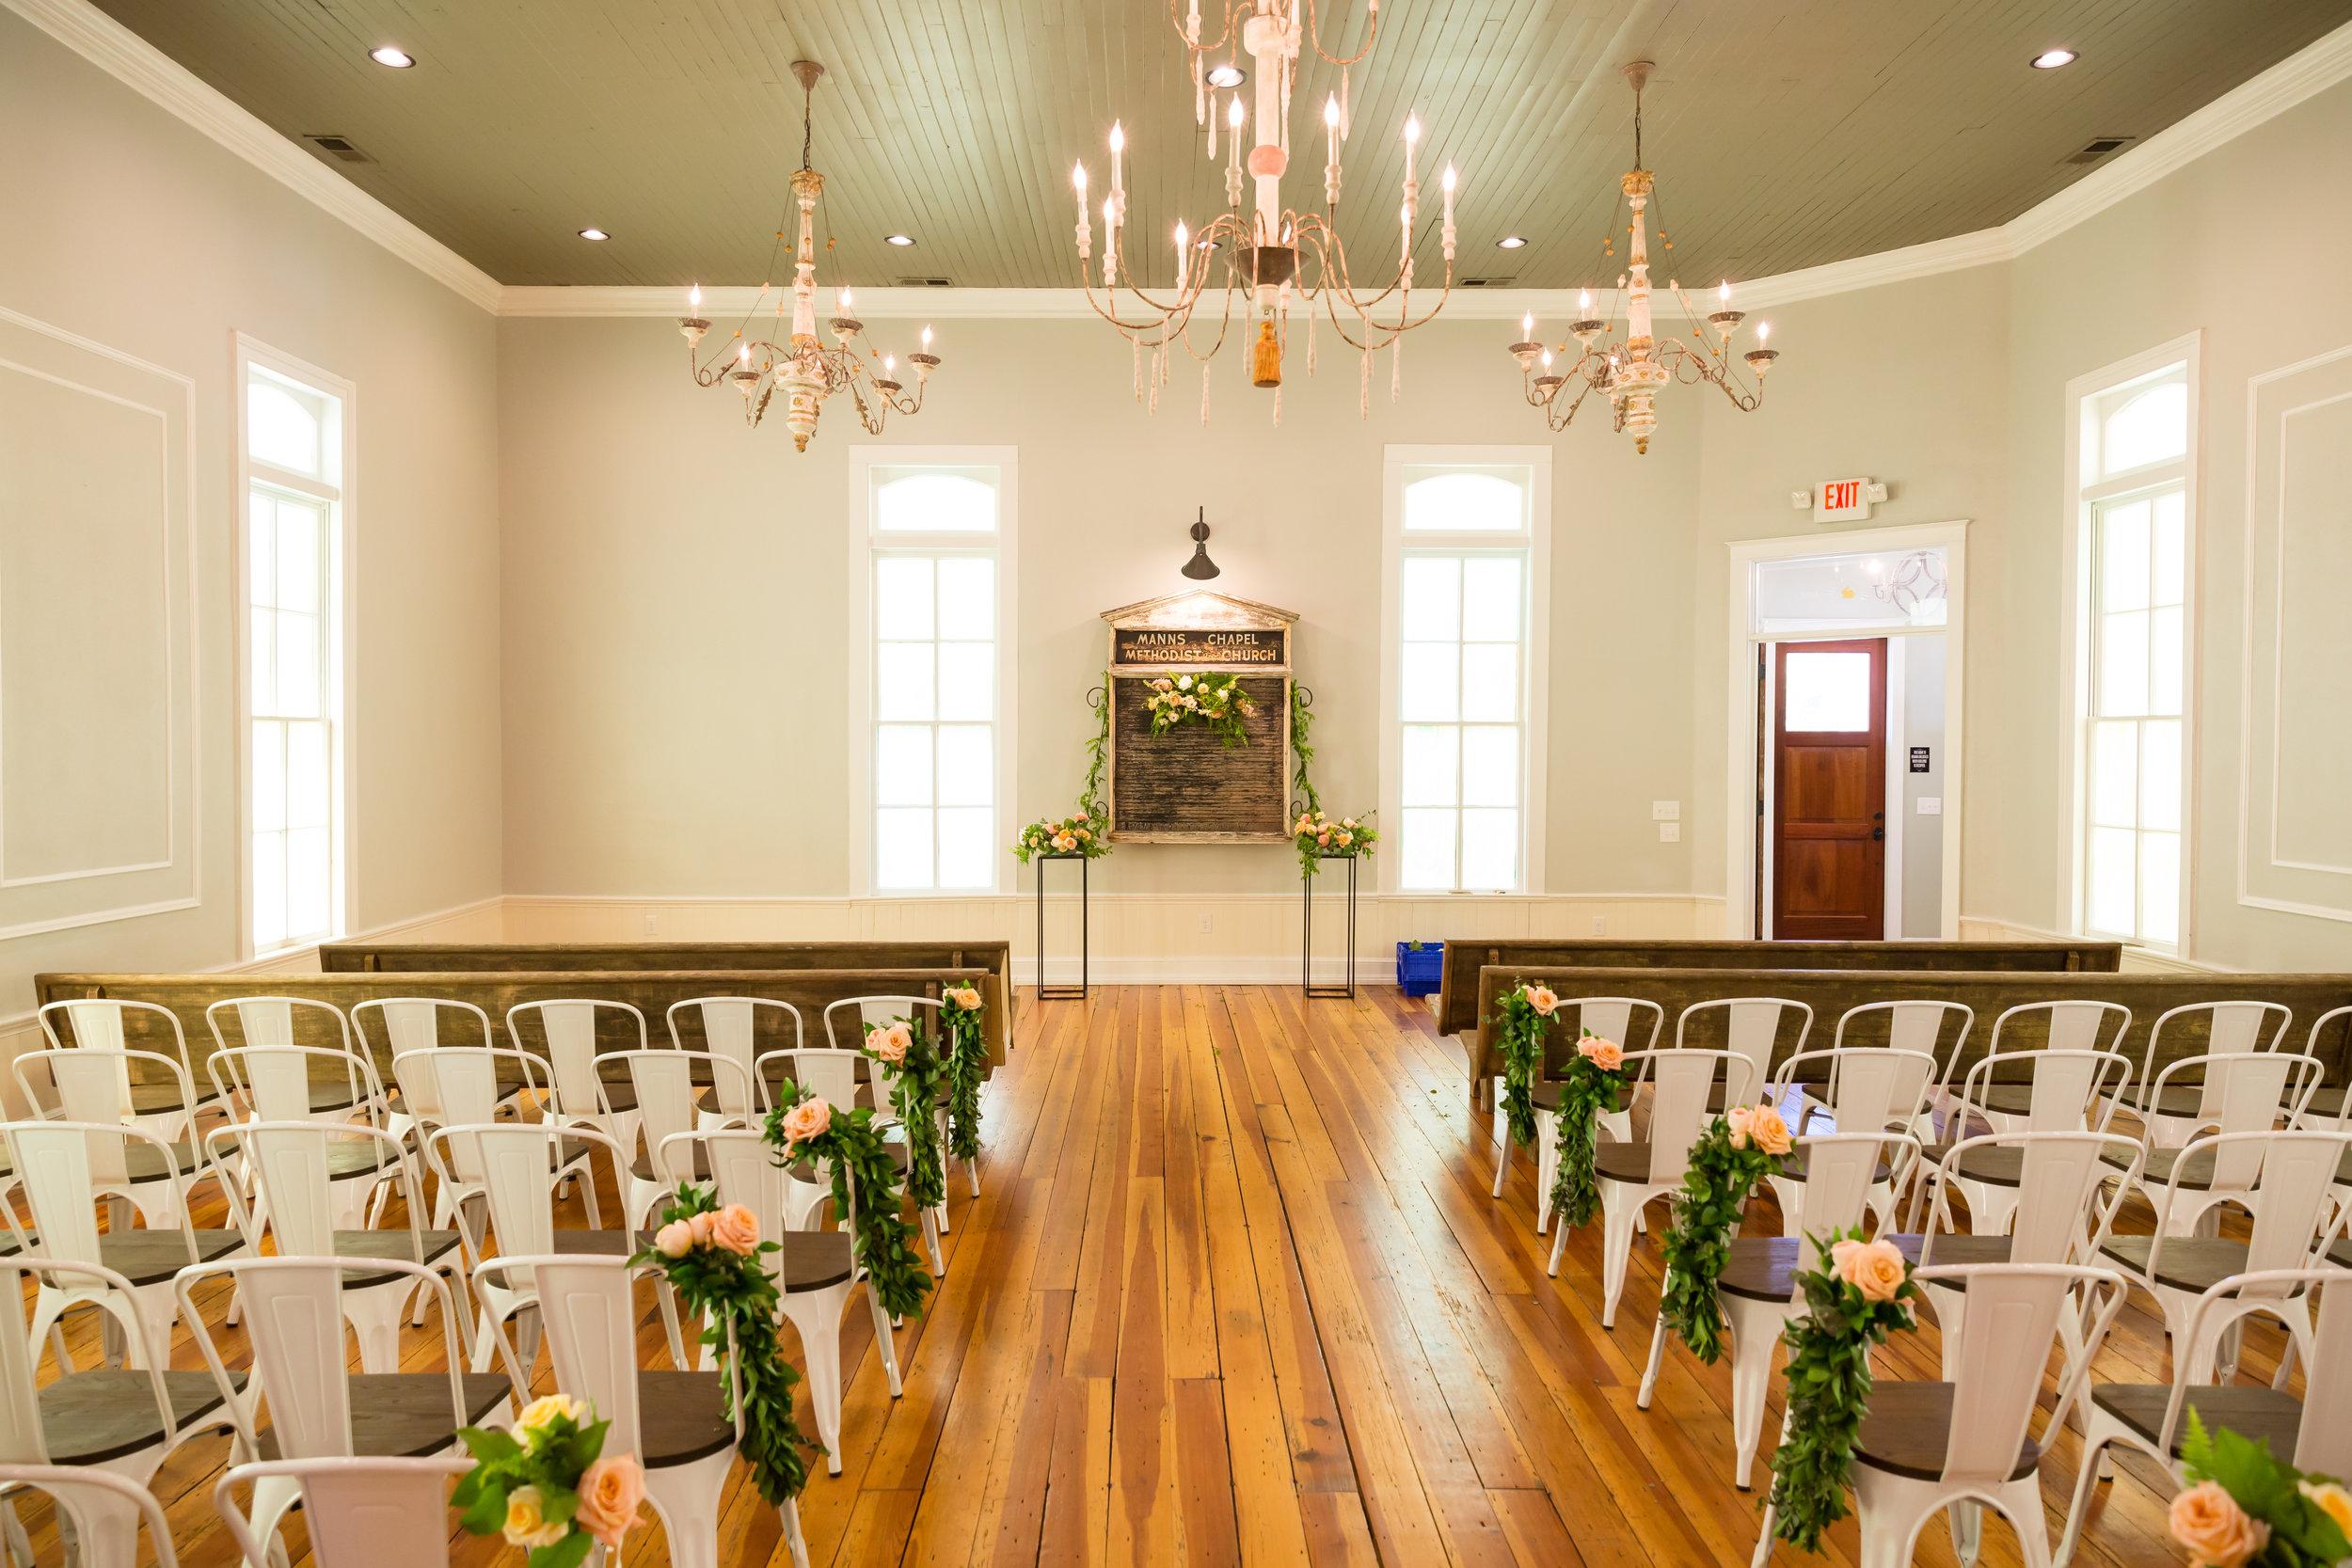 sarah_ikeem_wedding_at_the_parlour_at_manns_chapel_05.18.19-0562.jpg